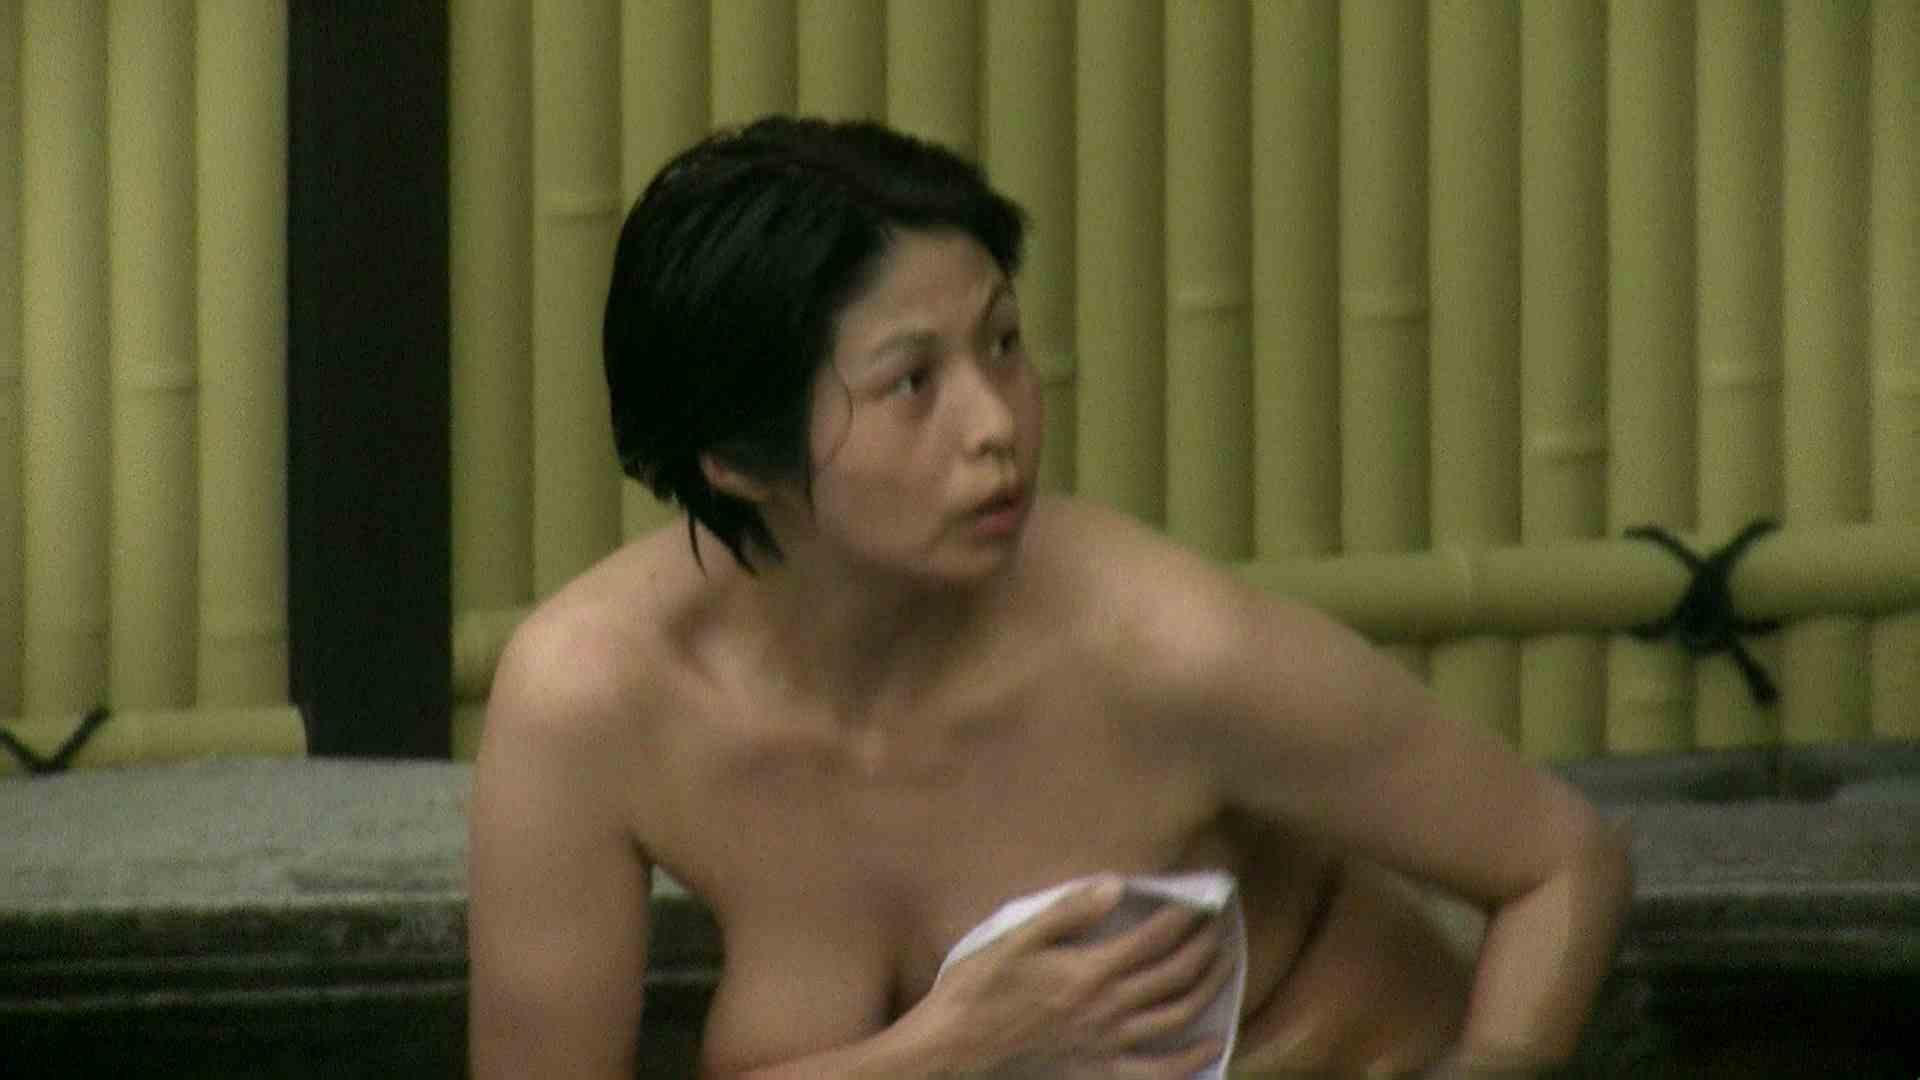 Aquaな露天風呂Vol.636 HなOL | 盗撮  82pic 28